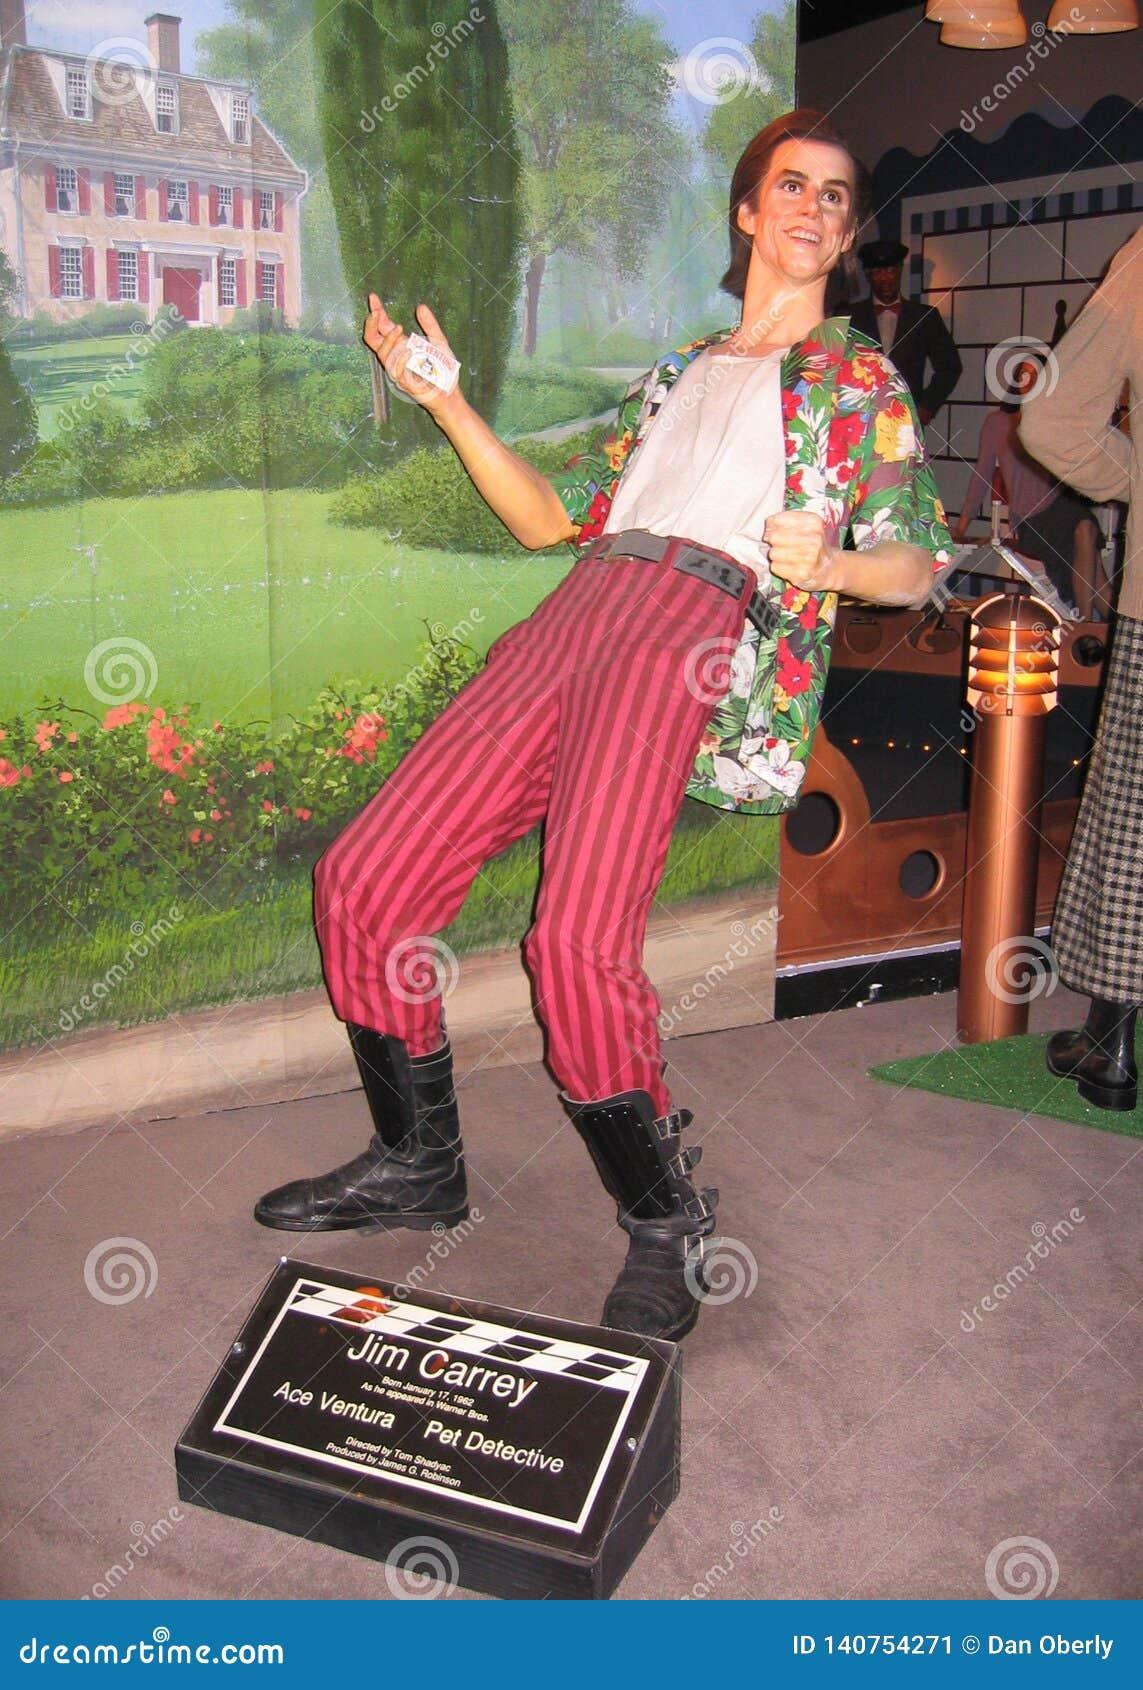 Figure de cire de Jim Carrey comme Ace